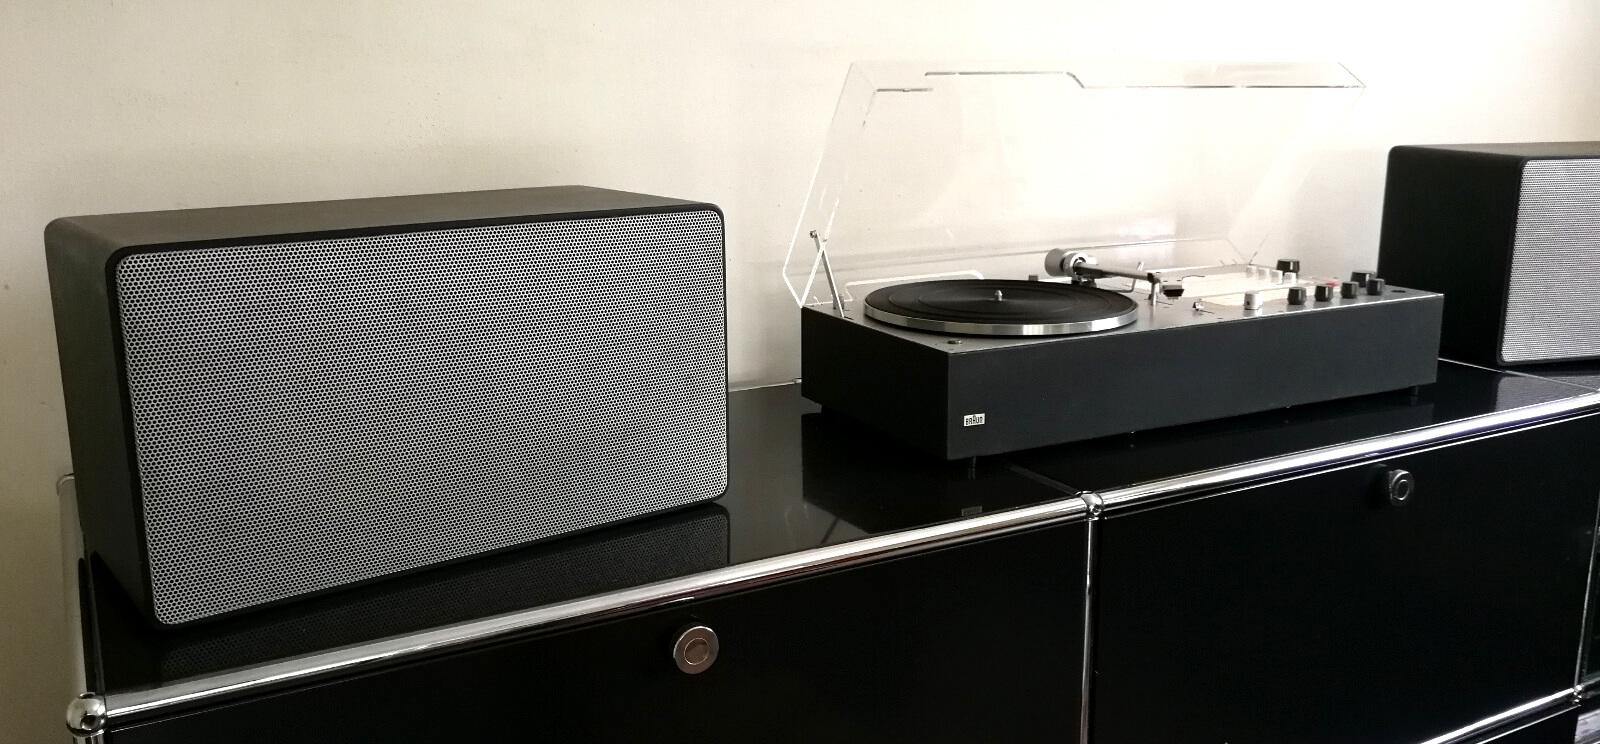 vintage braun audio 310 anthracite with L 625 speakers black